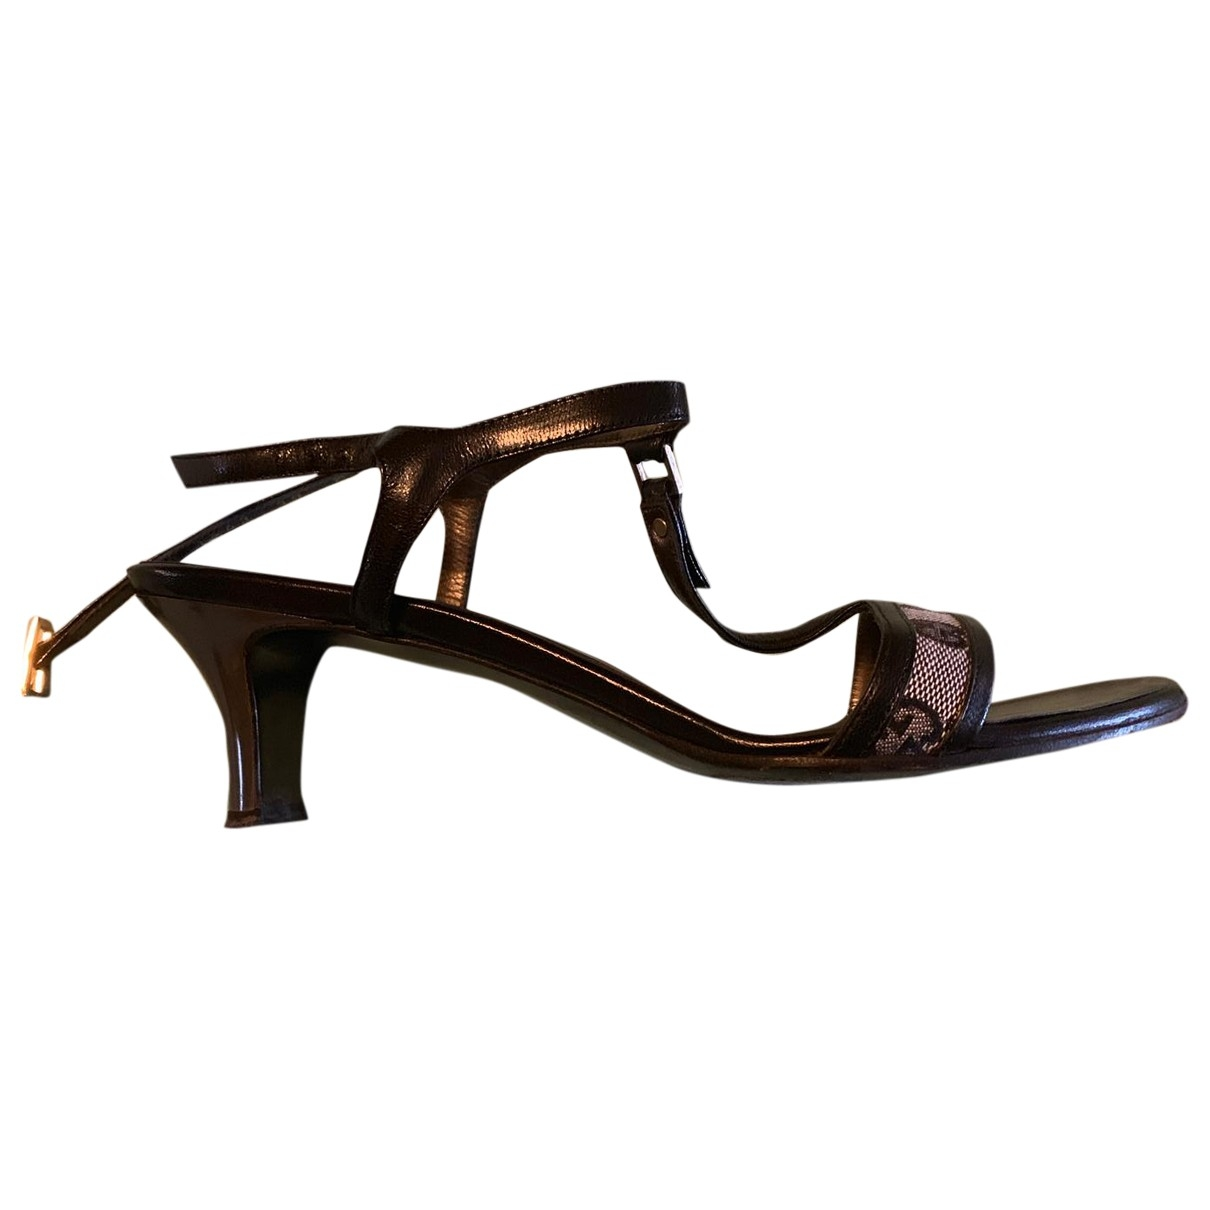 Gucci \N Black Leather Sandals for Women 39 EU